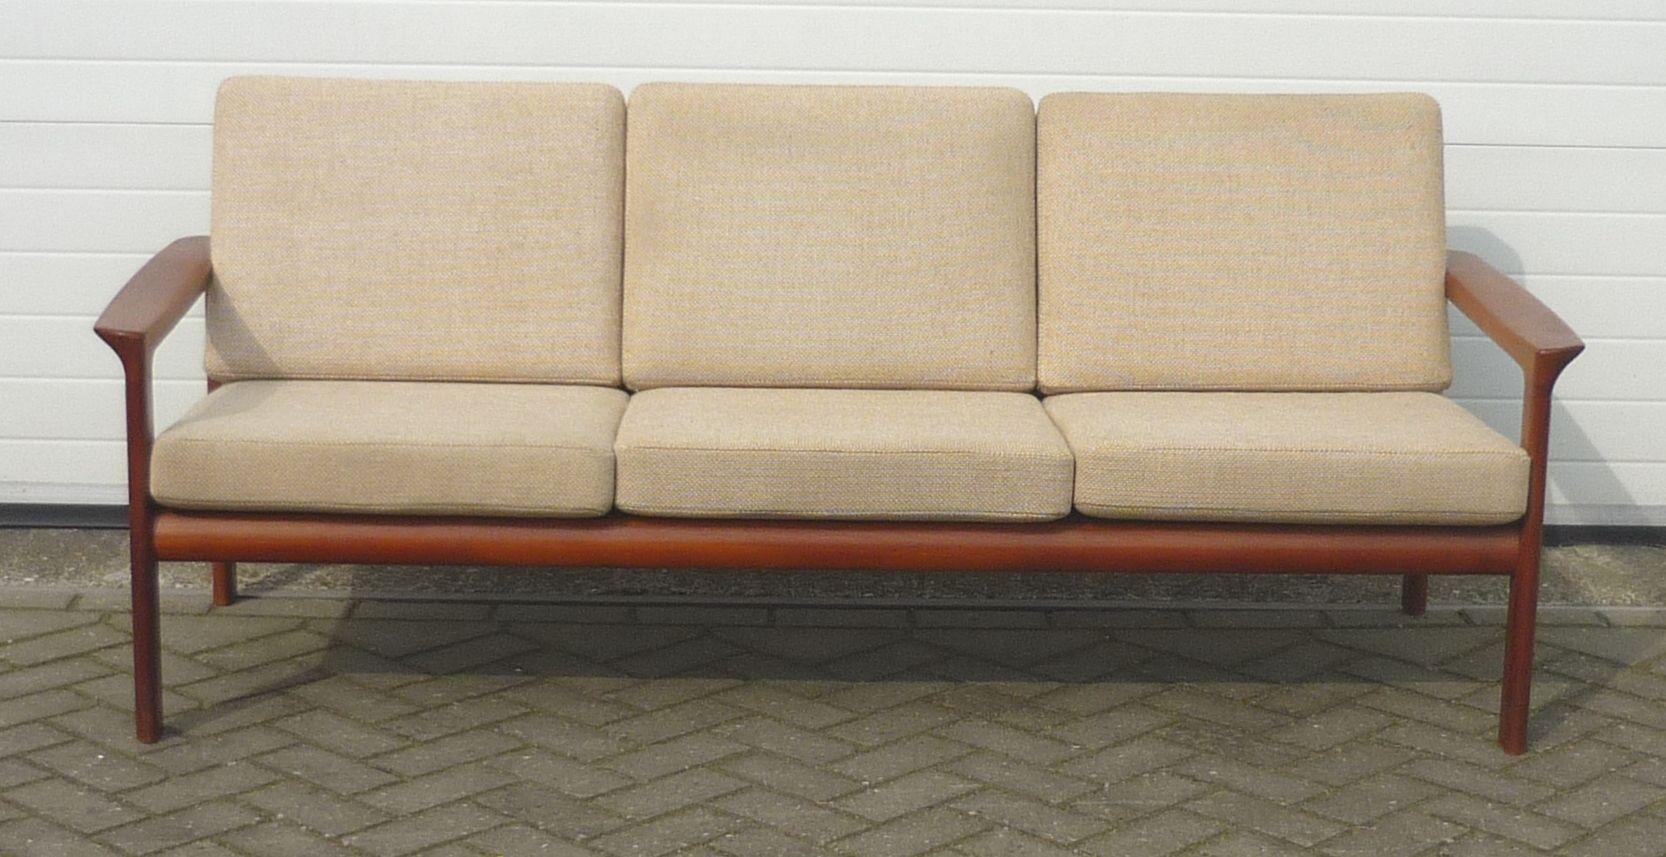 danish teak borneo three seater sofa by sven ellekaer for. Black Bedroom Furniture Sets. Home Design Ideas